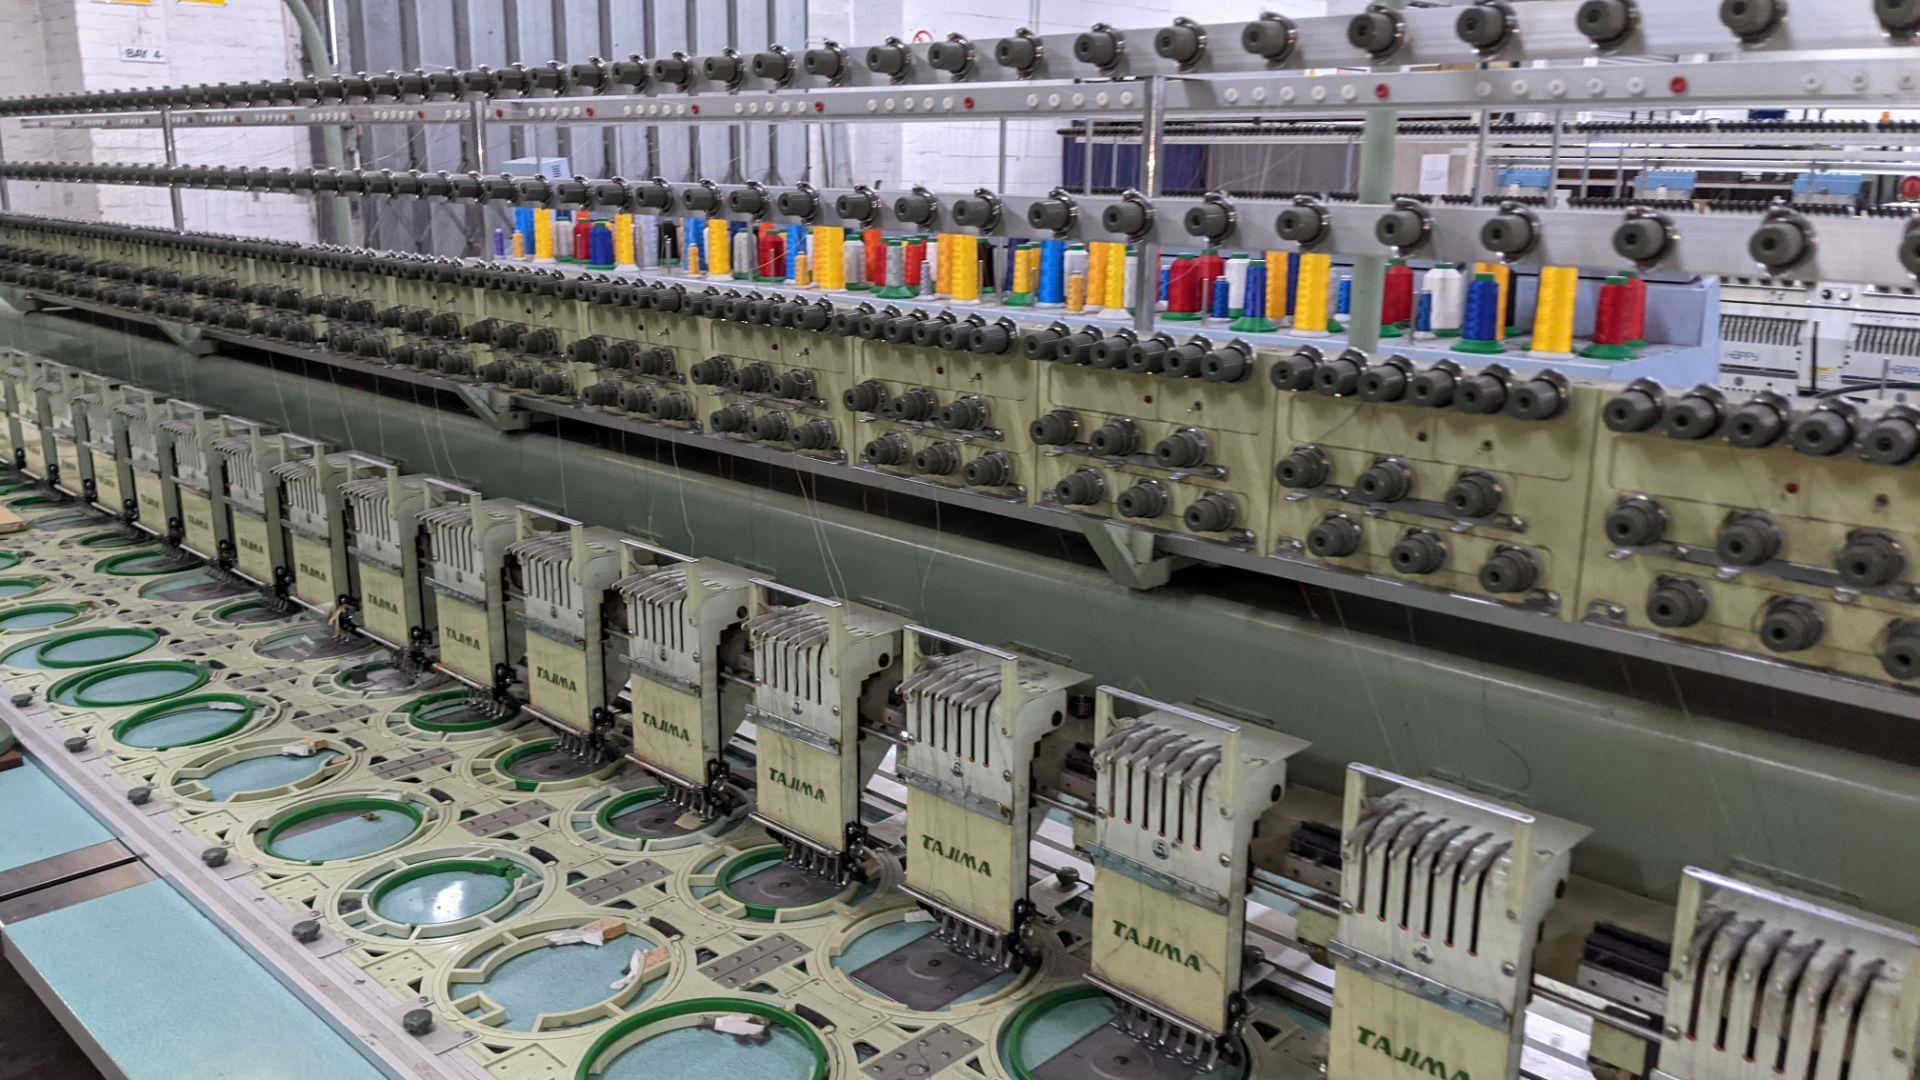 Tokai Tajima electronic 20 head automatic embroidery machine model TMEF-H620 - Image 7 of 25